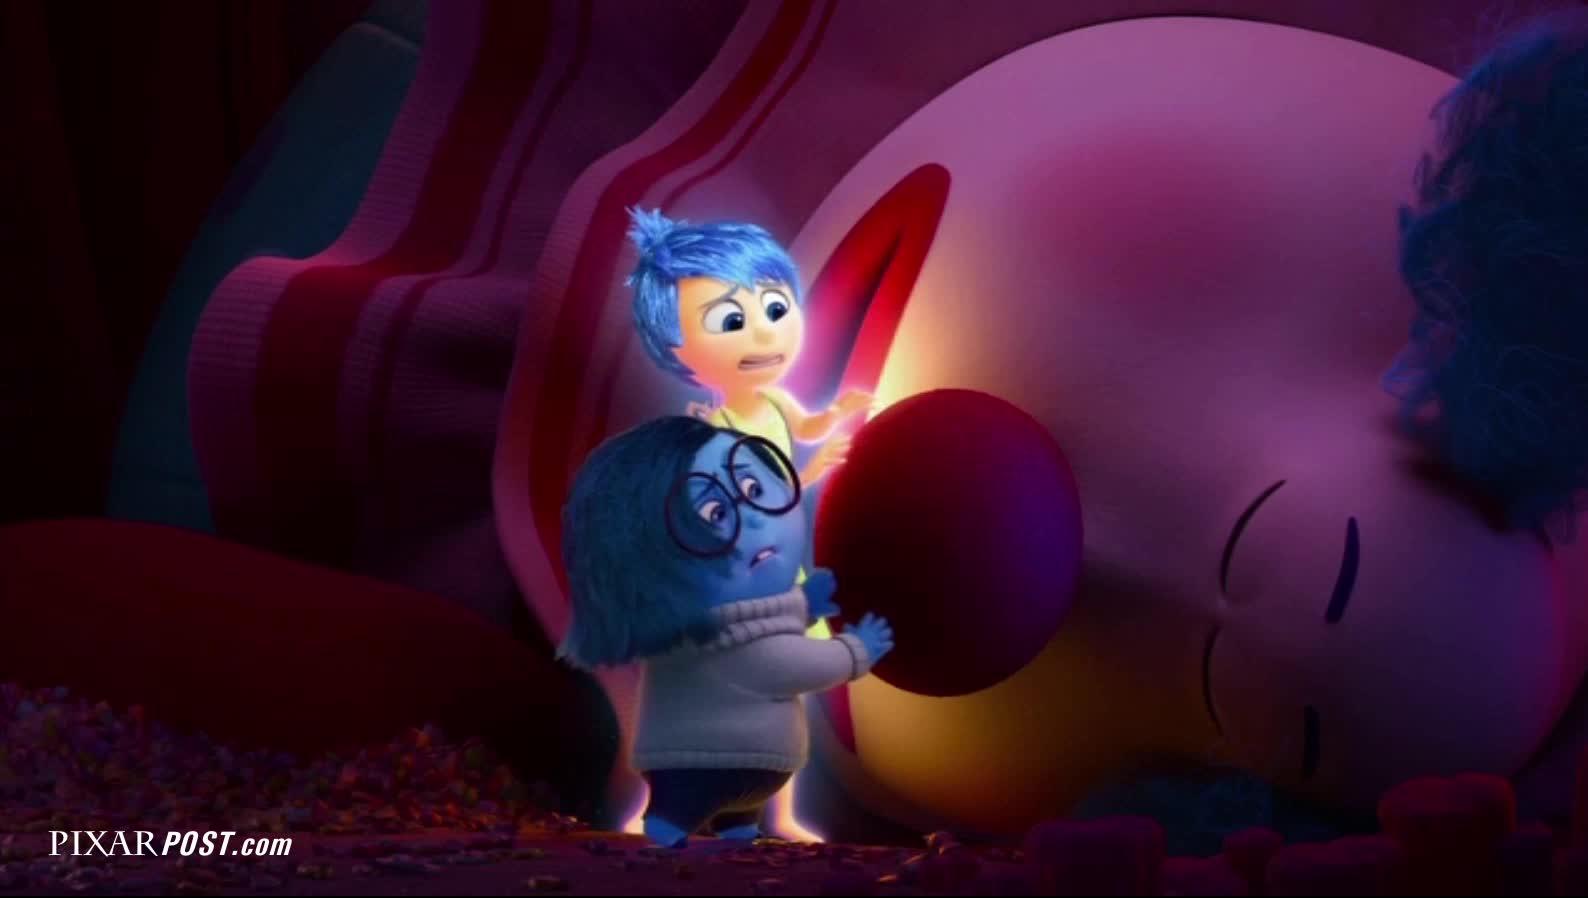 Story Disney Dvd Pixar 2 Toy Toy Story